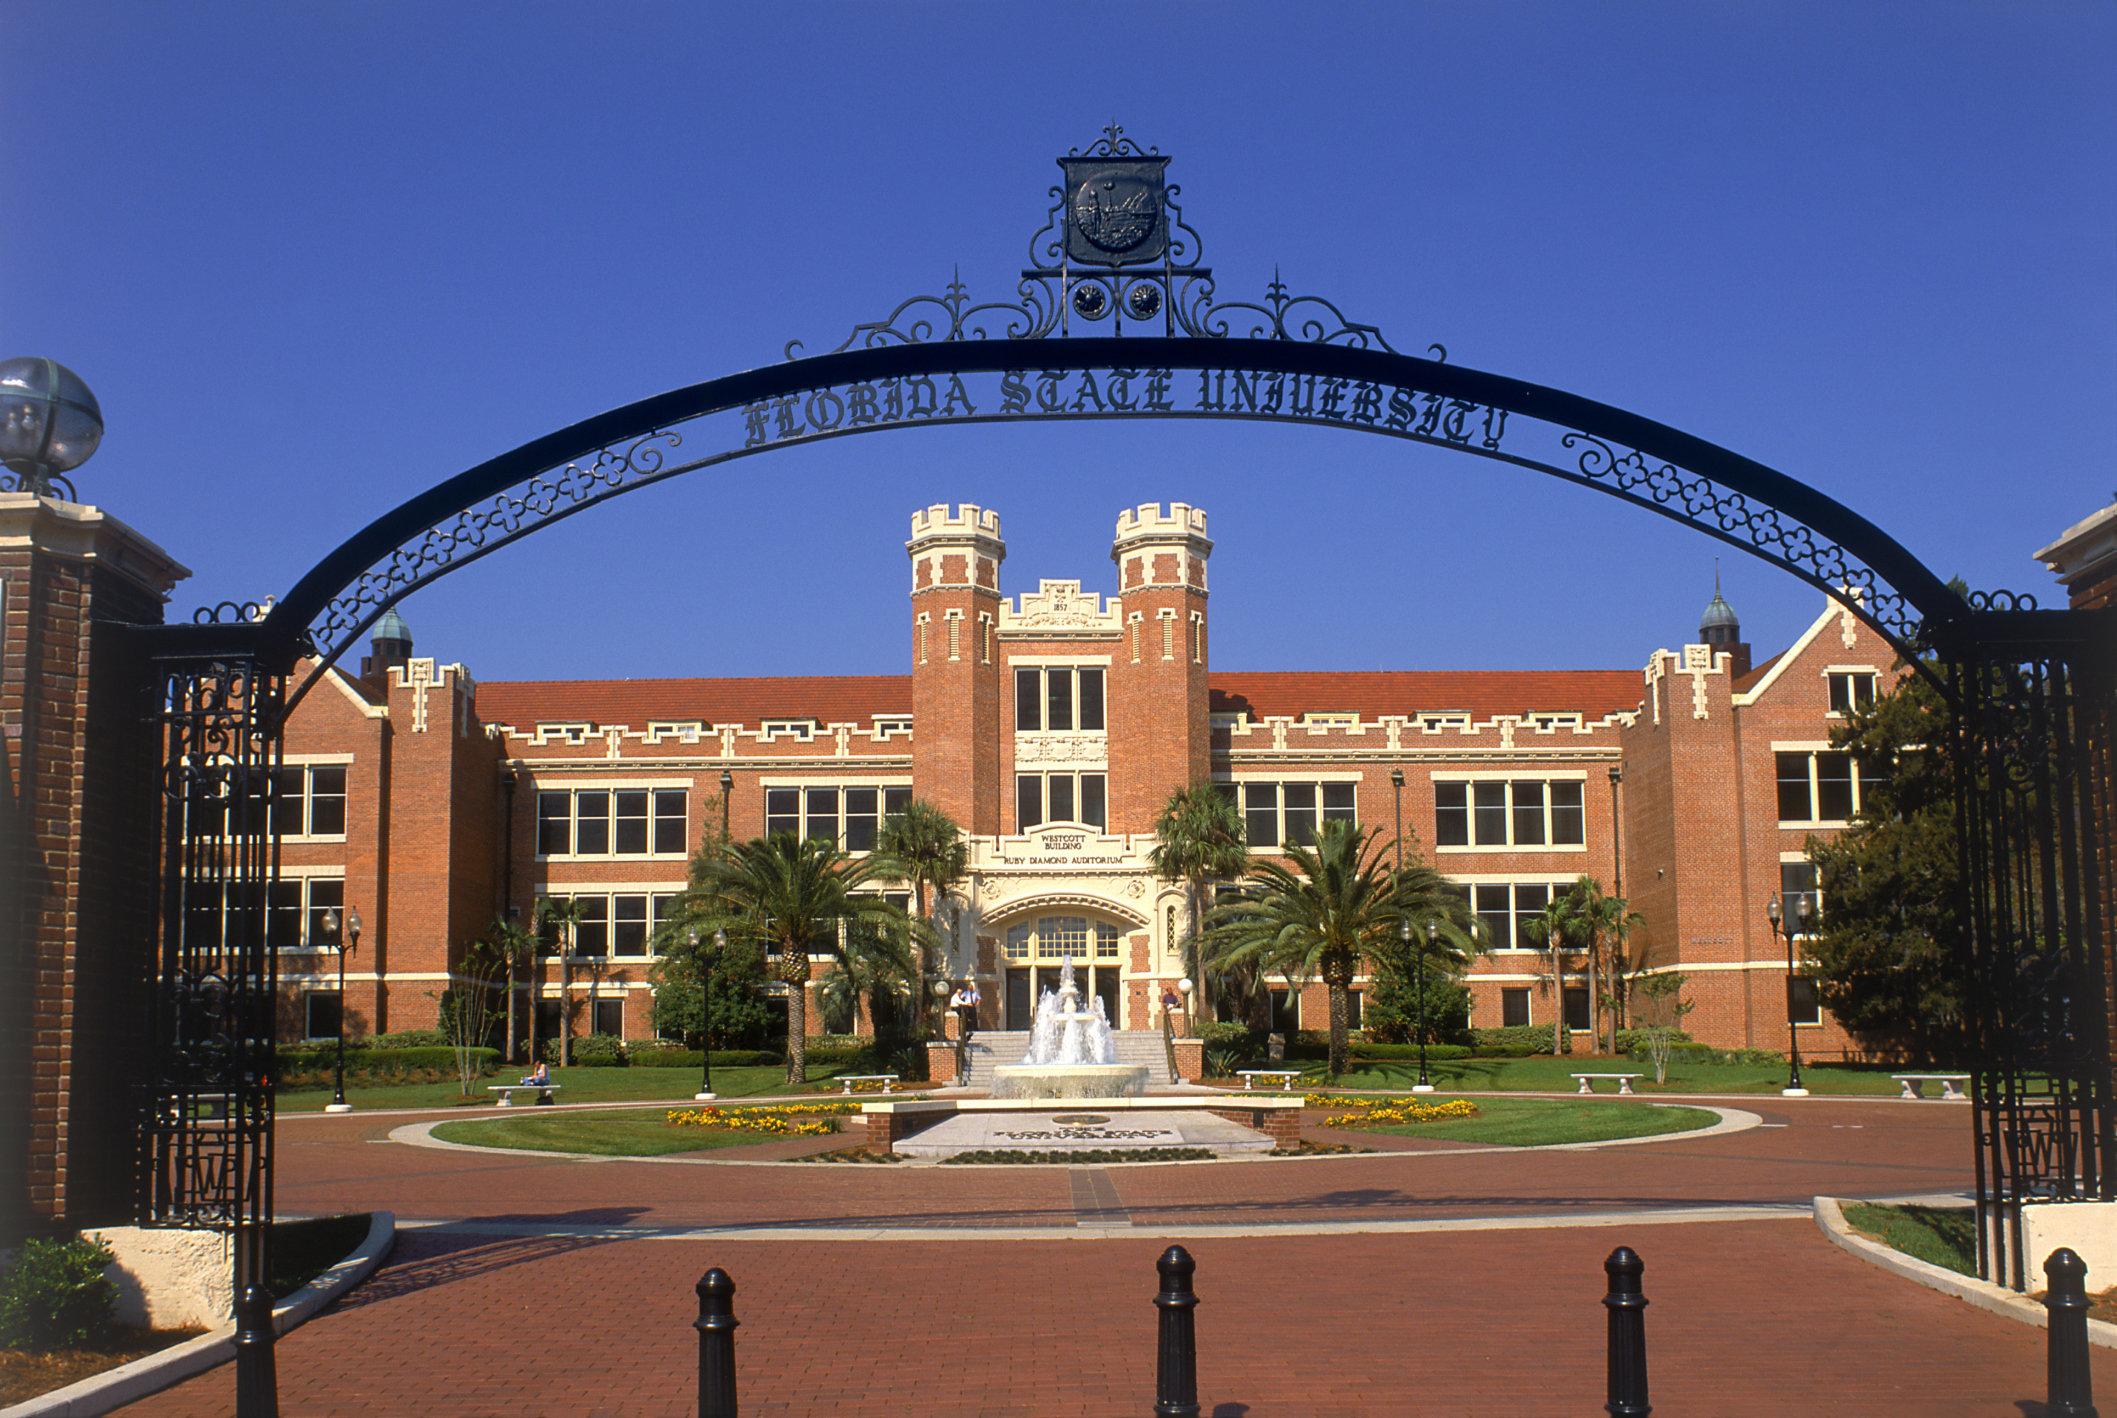 florida state university, tallahassee, fl